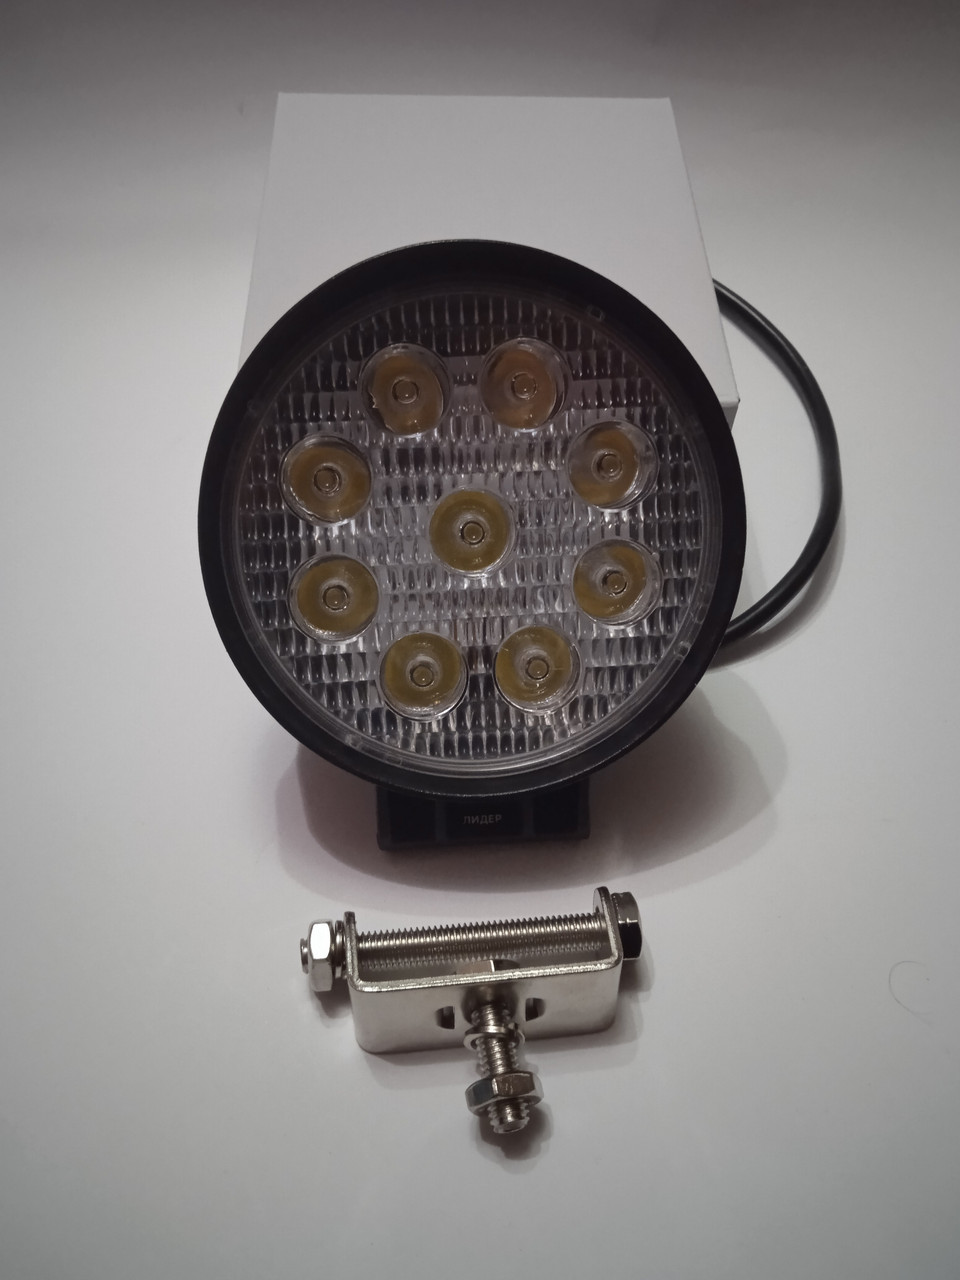 Рабочий LED фара 27 Вт Лидер